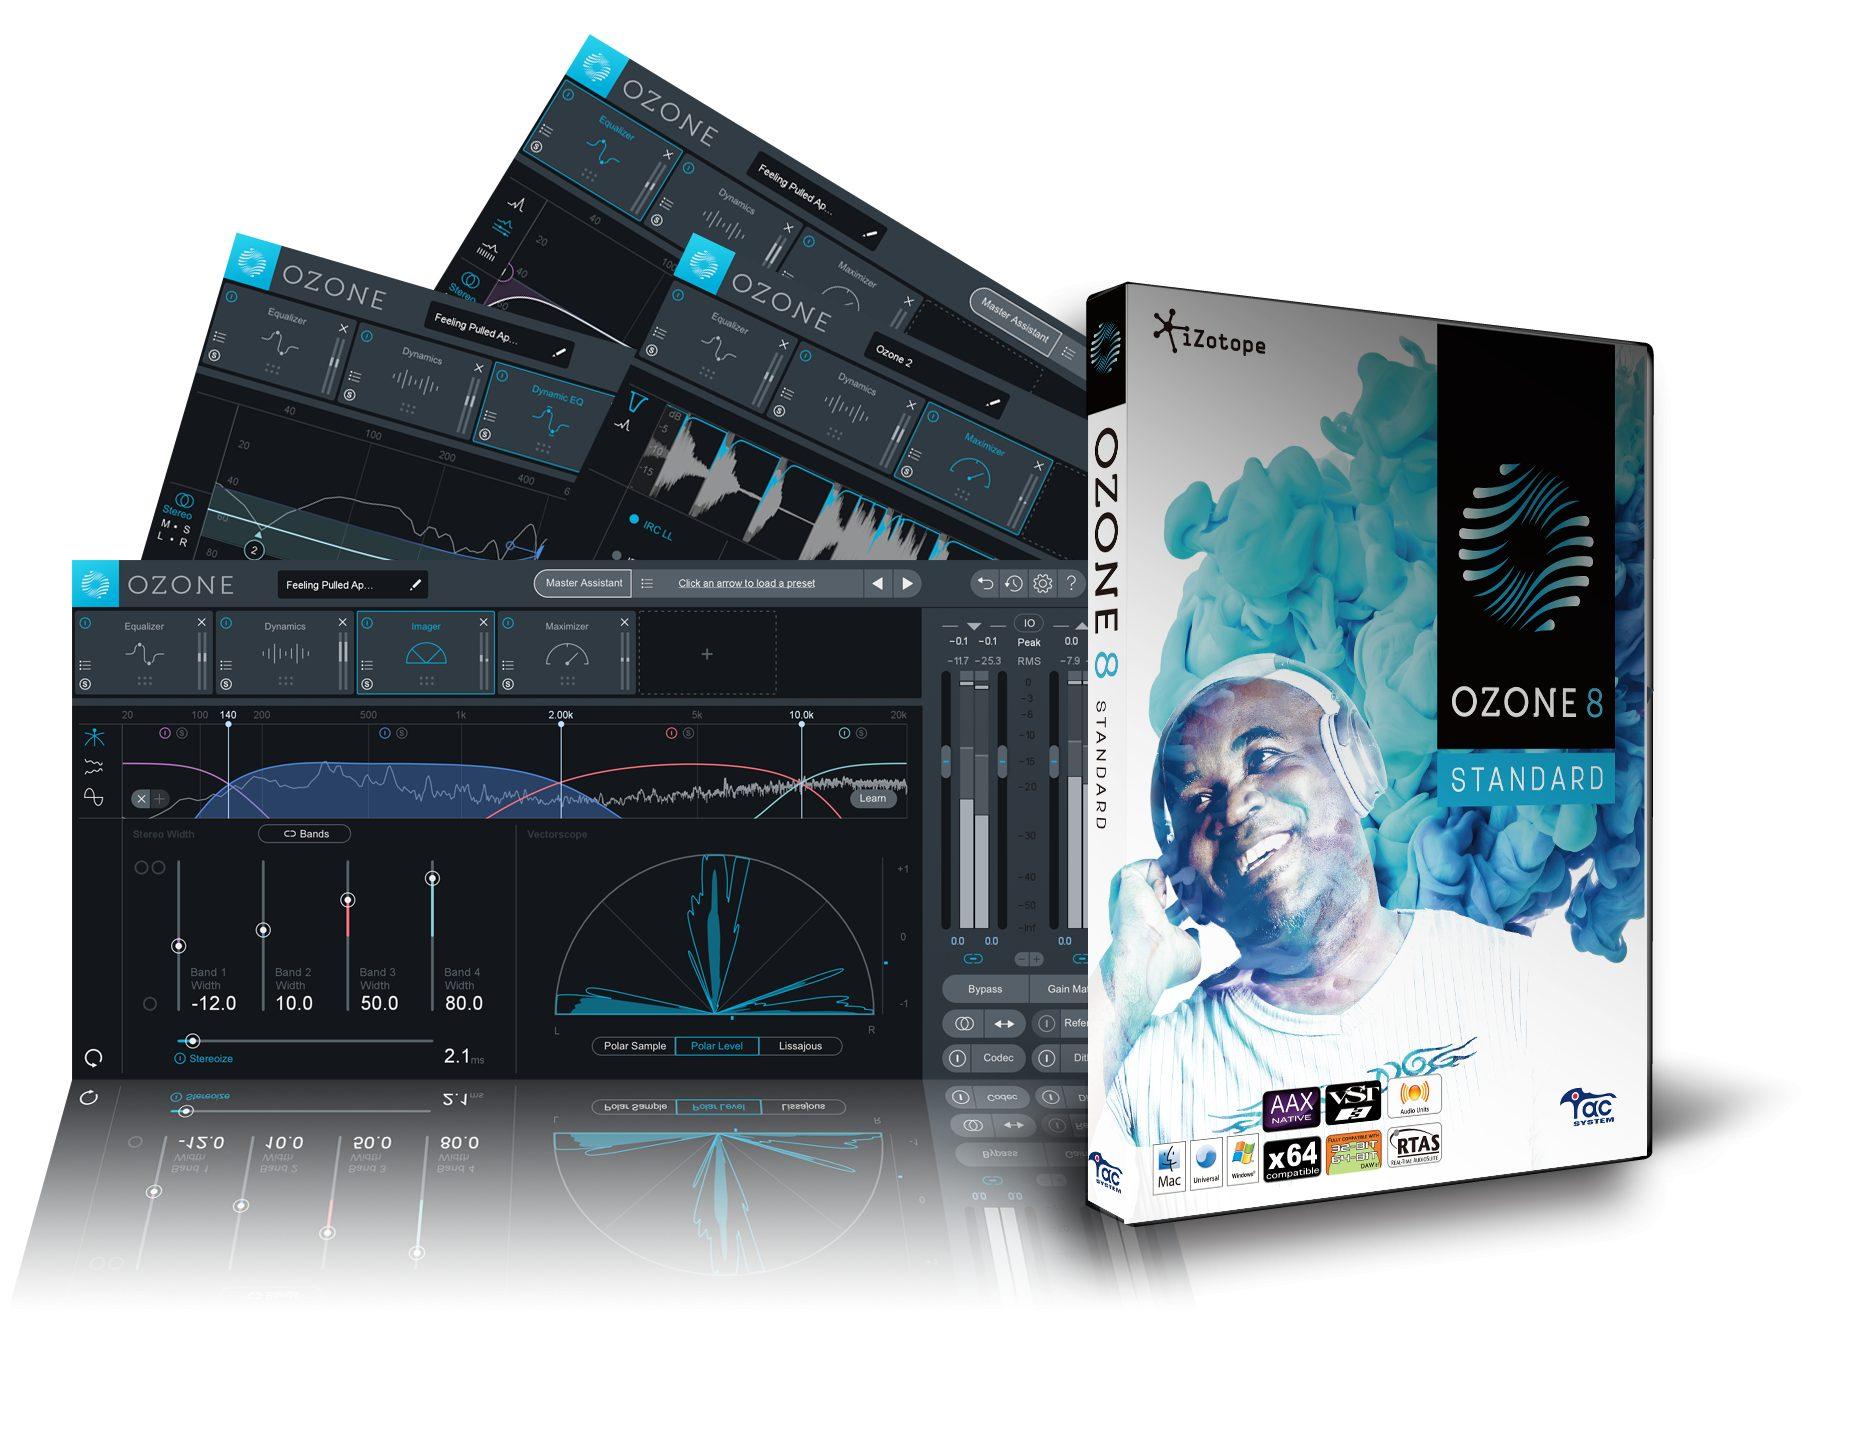 【80%OFF】iZotope Ozone 8 Standardが再びセール中!通常27,300円が5,320円に